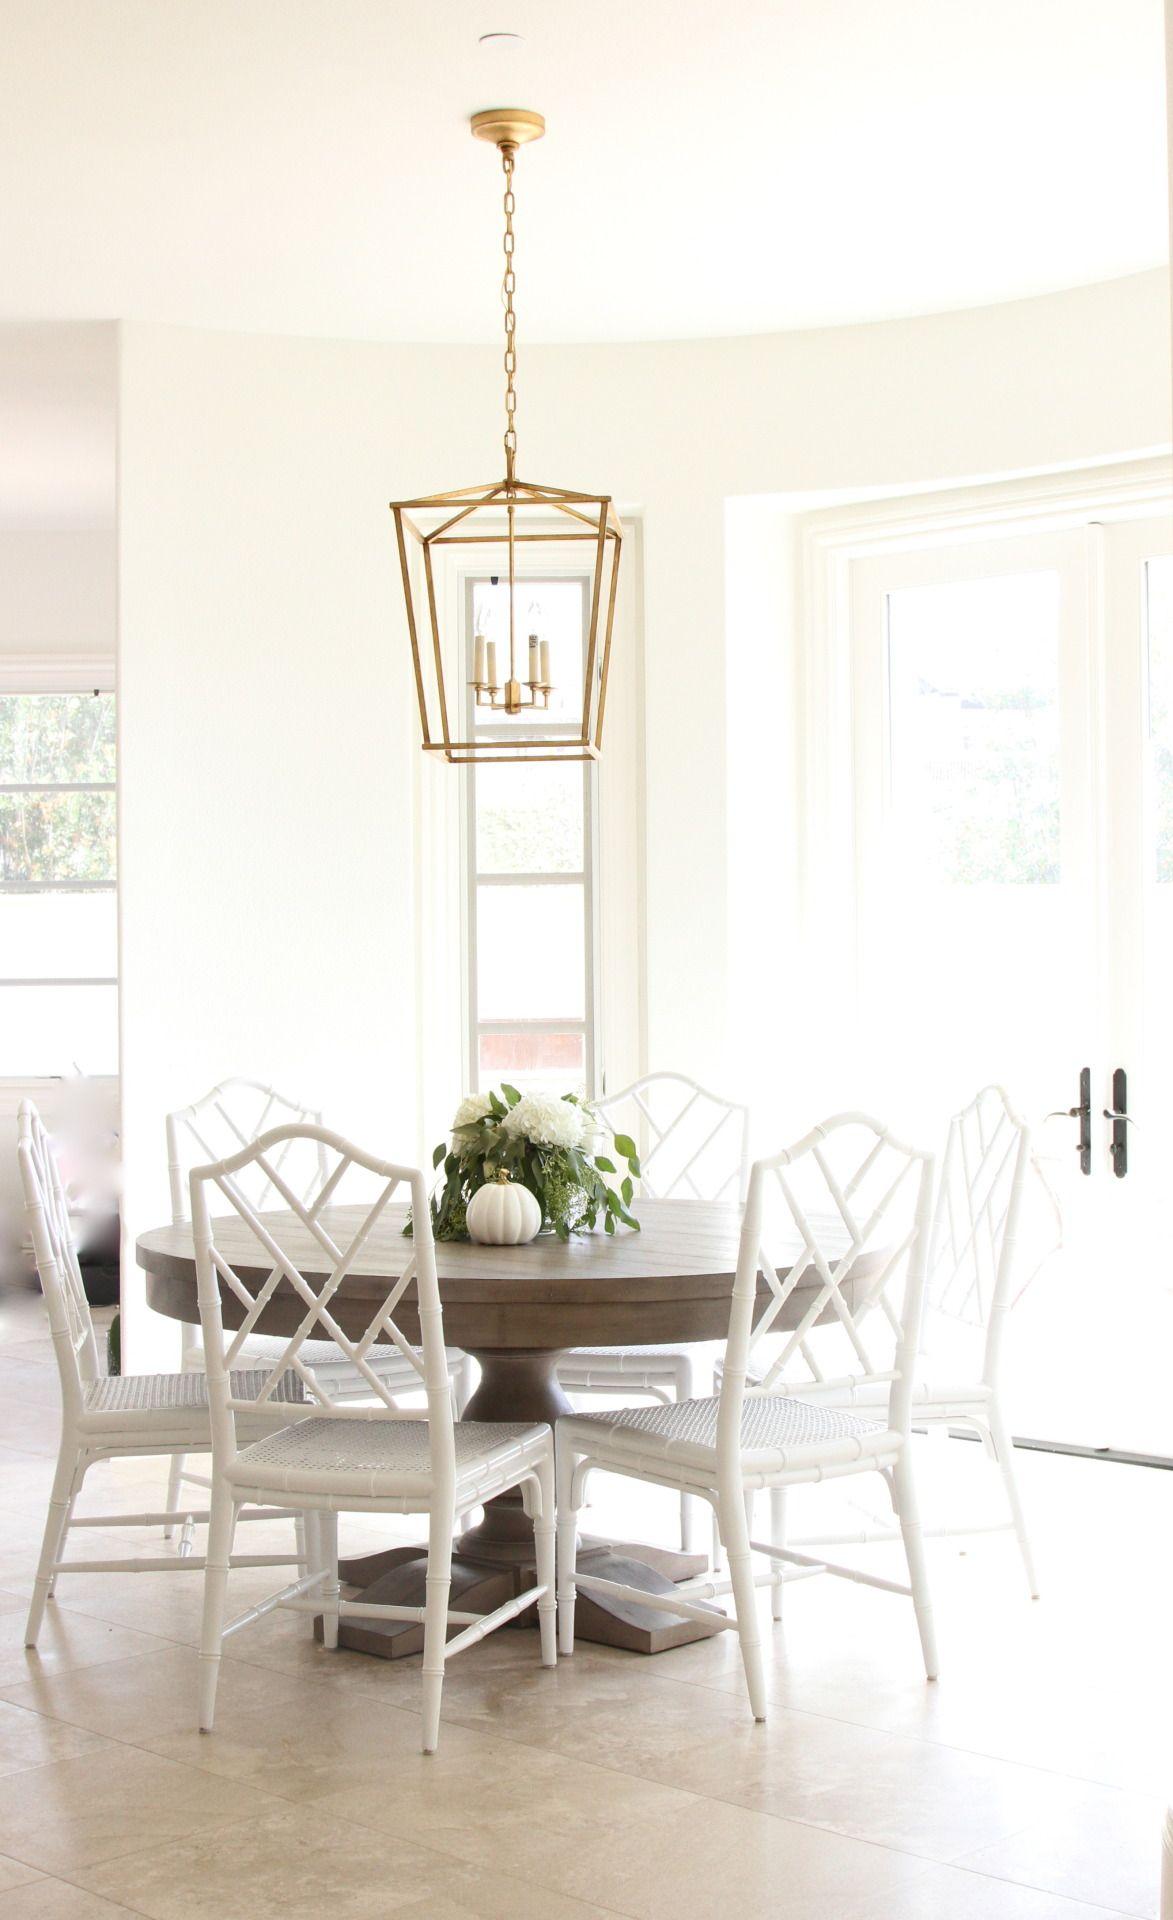 Dining Space With Gold Lantern Light Fixture Ballard Designs Bamboo Chairs